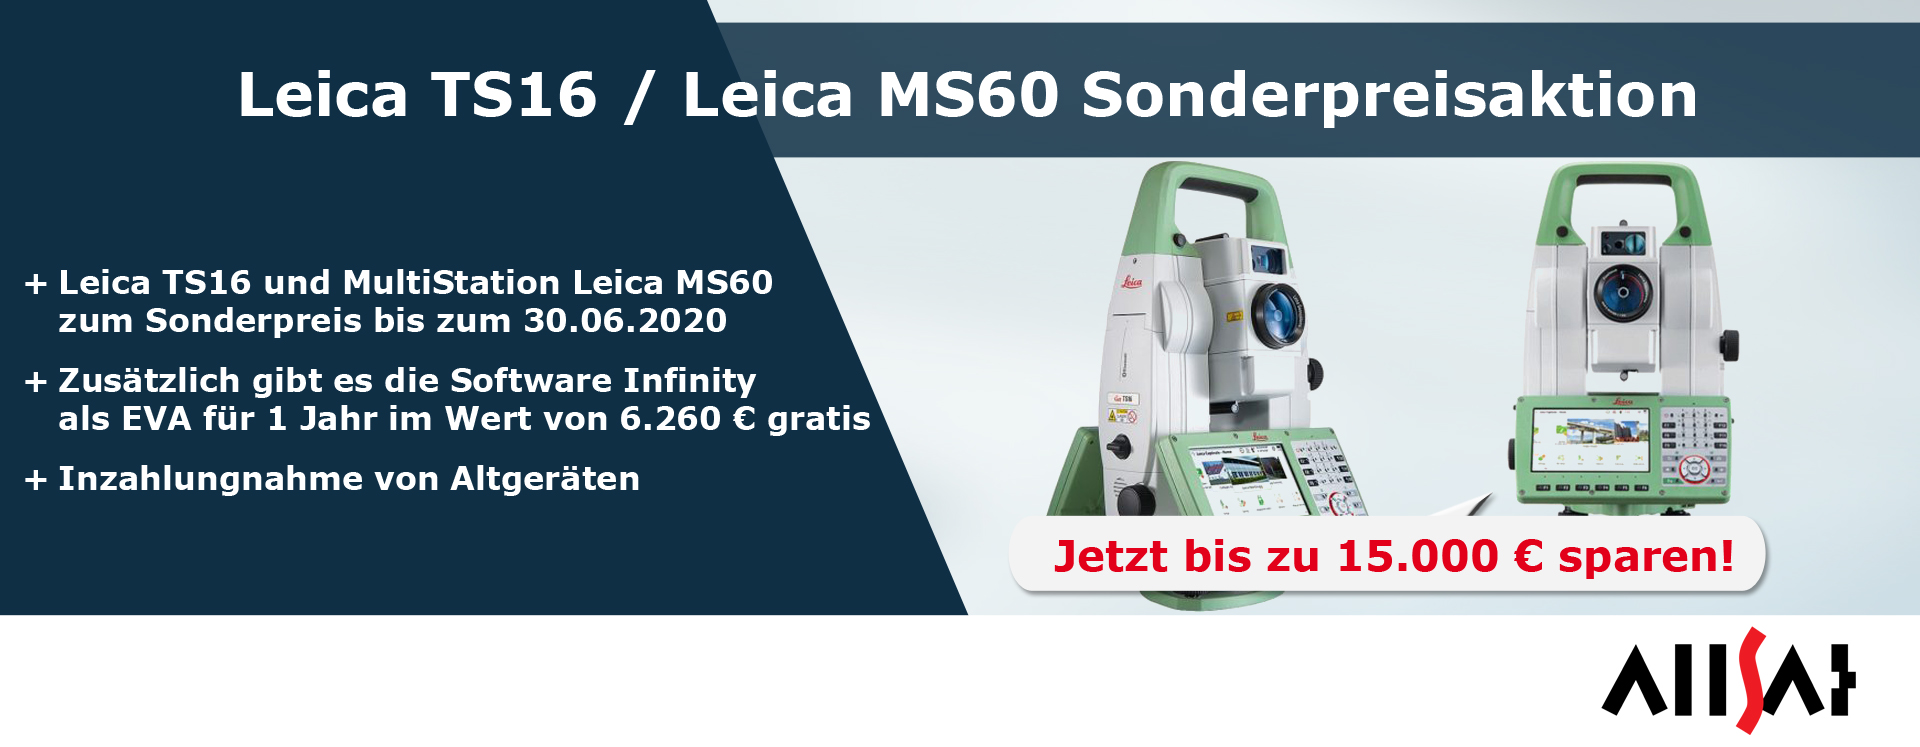 TS16/MS60 Sonderpreisaktion Banner Allsat